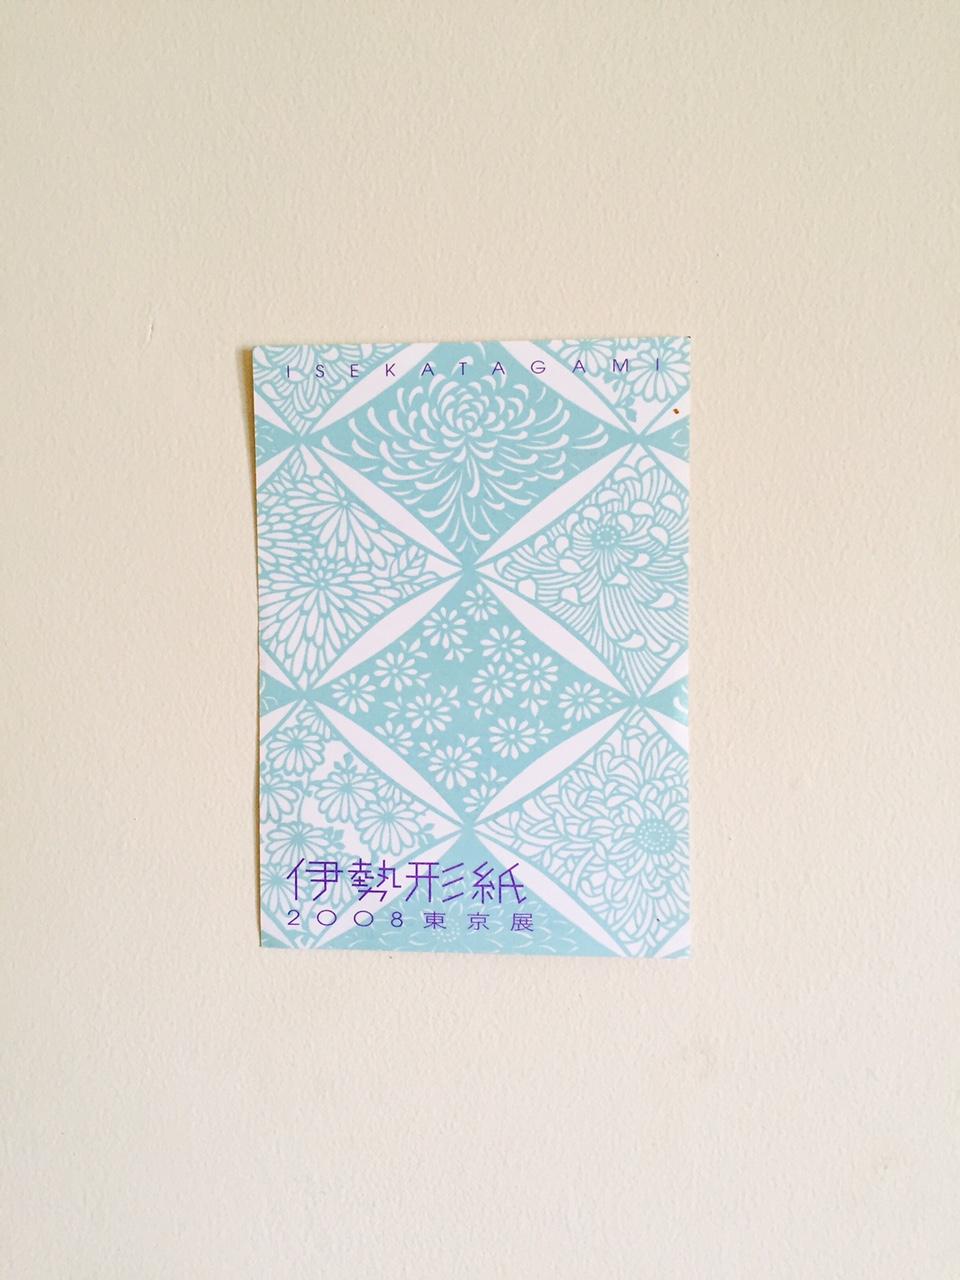 OZONE 伊勢型紙展